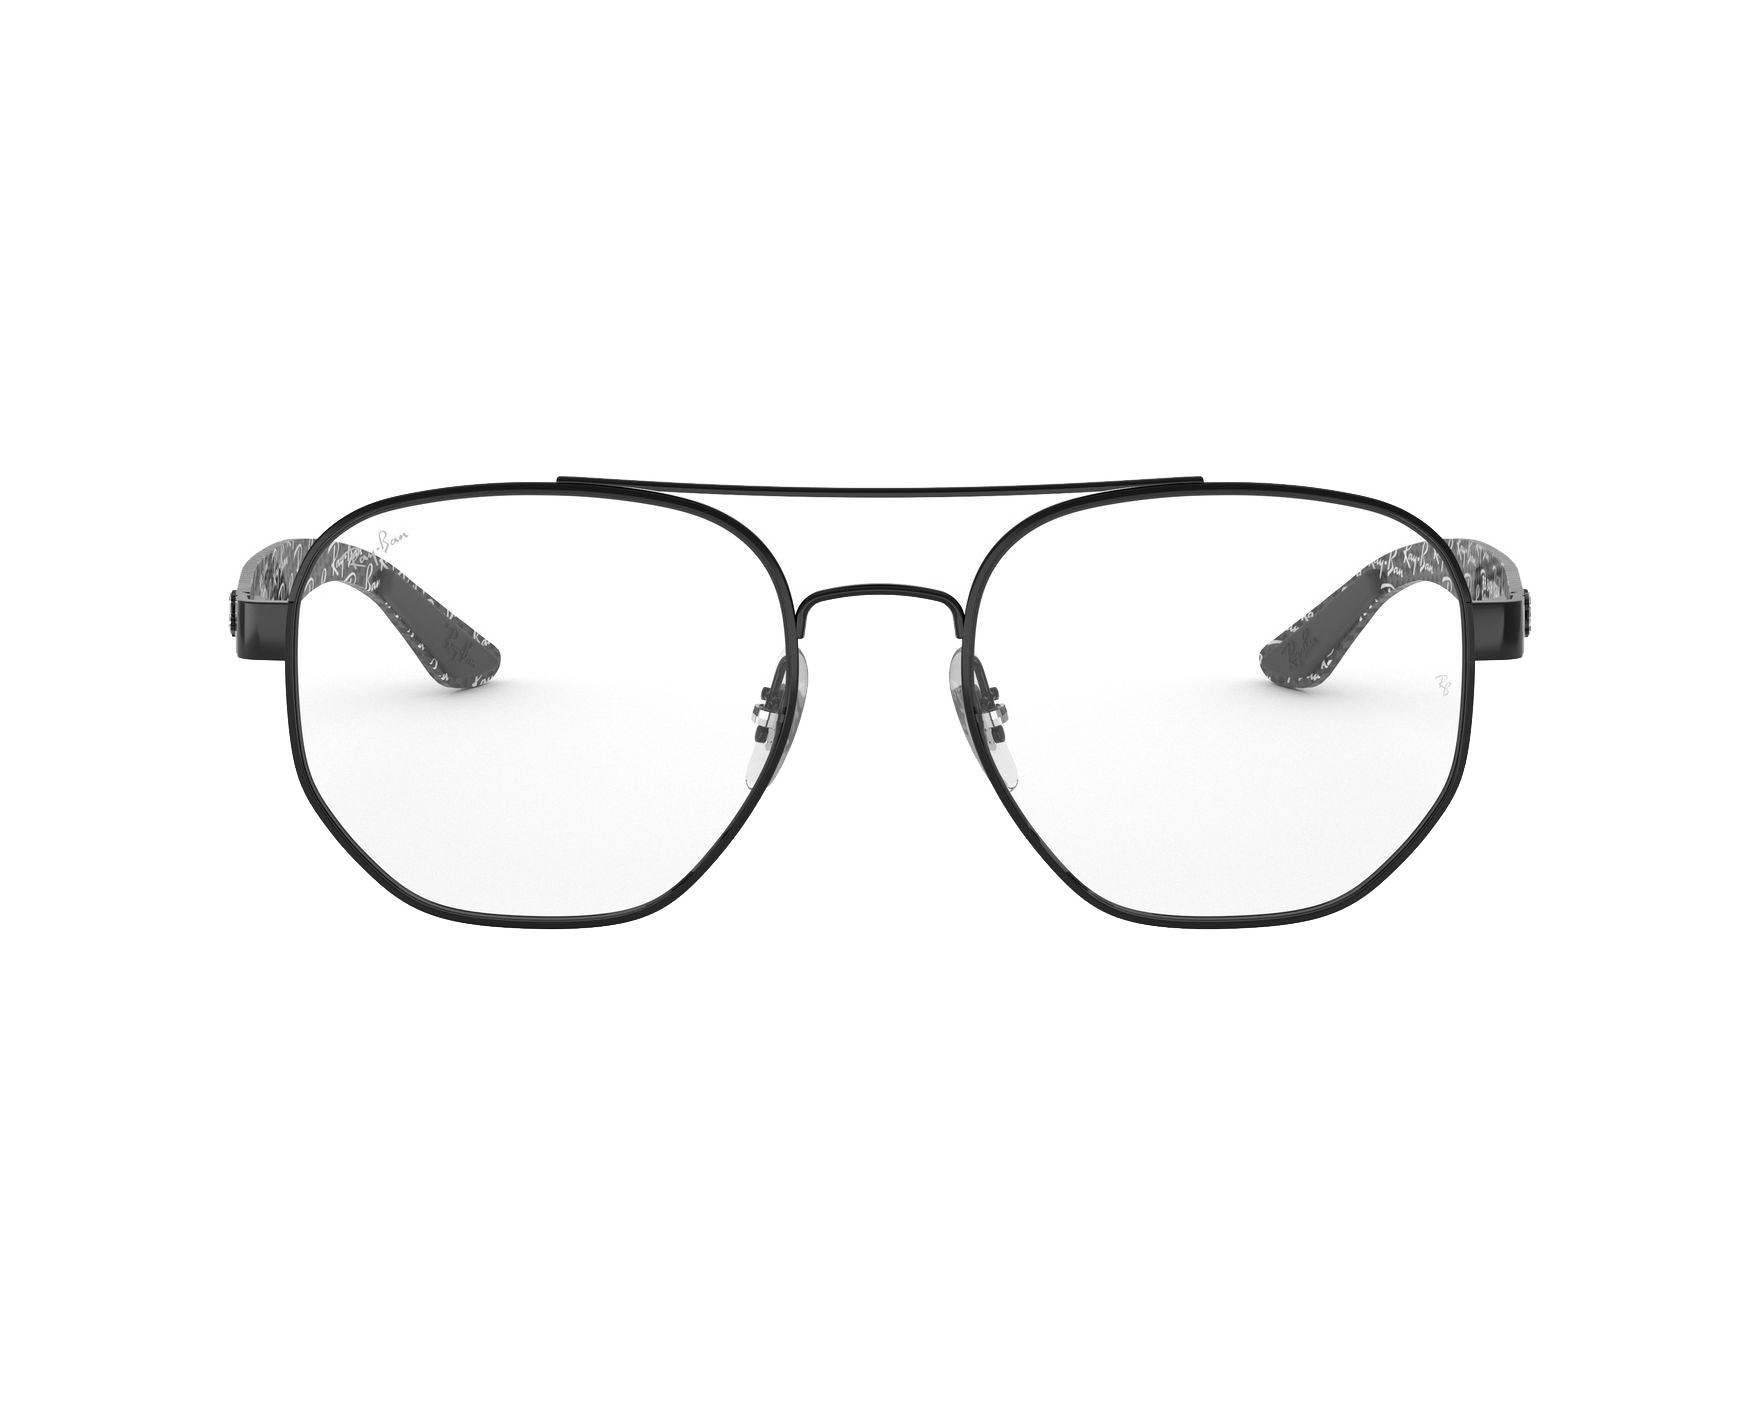 53bdb02b52 Gafas Graduadas Ray-Ban RX-8418 2509 53-18 Negra Gris Vista de